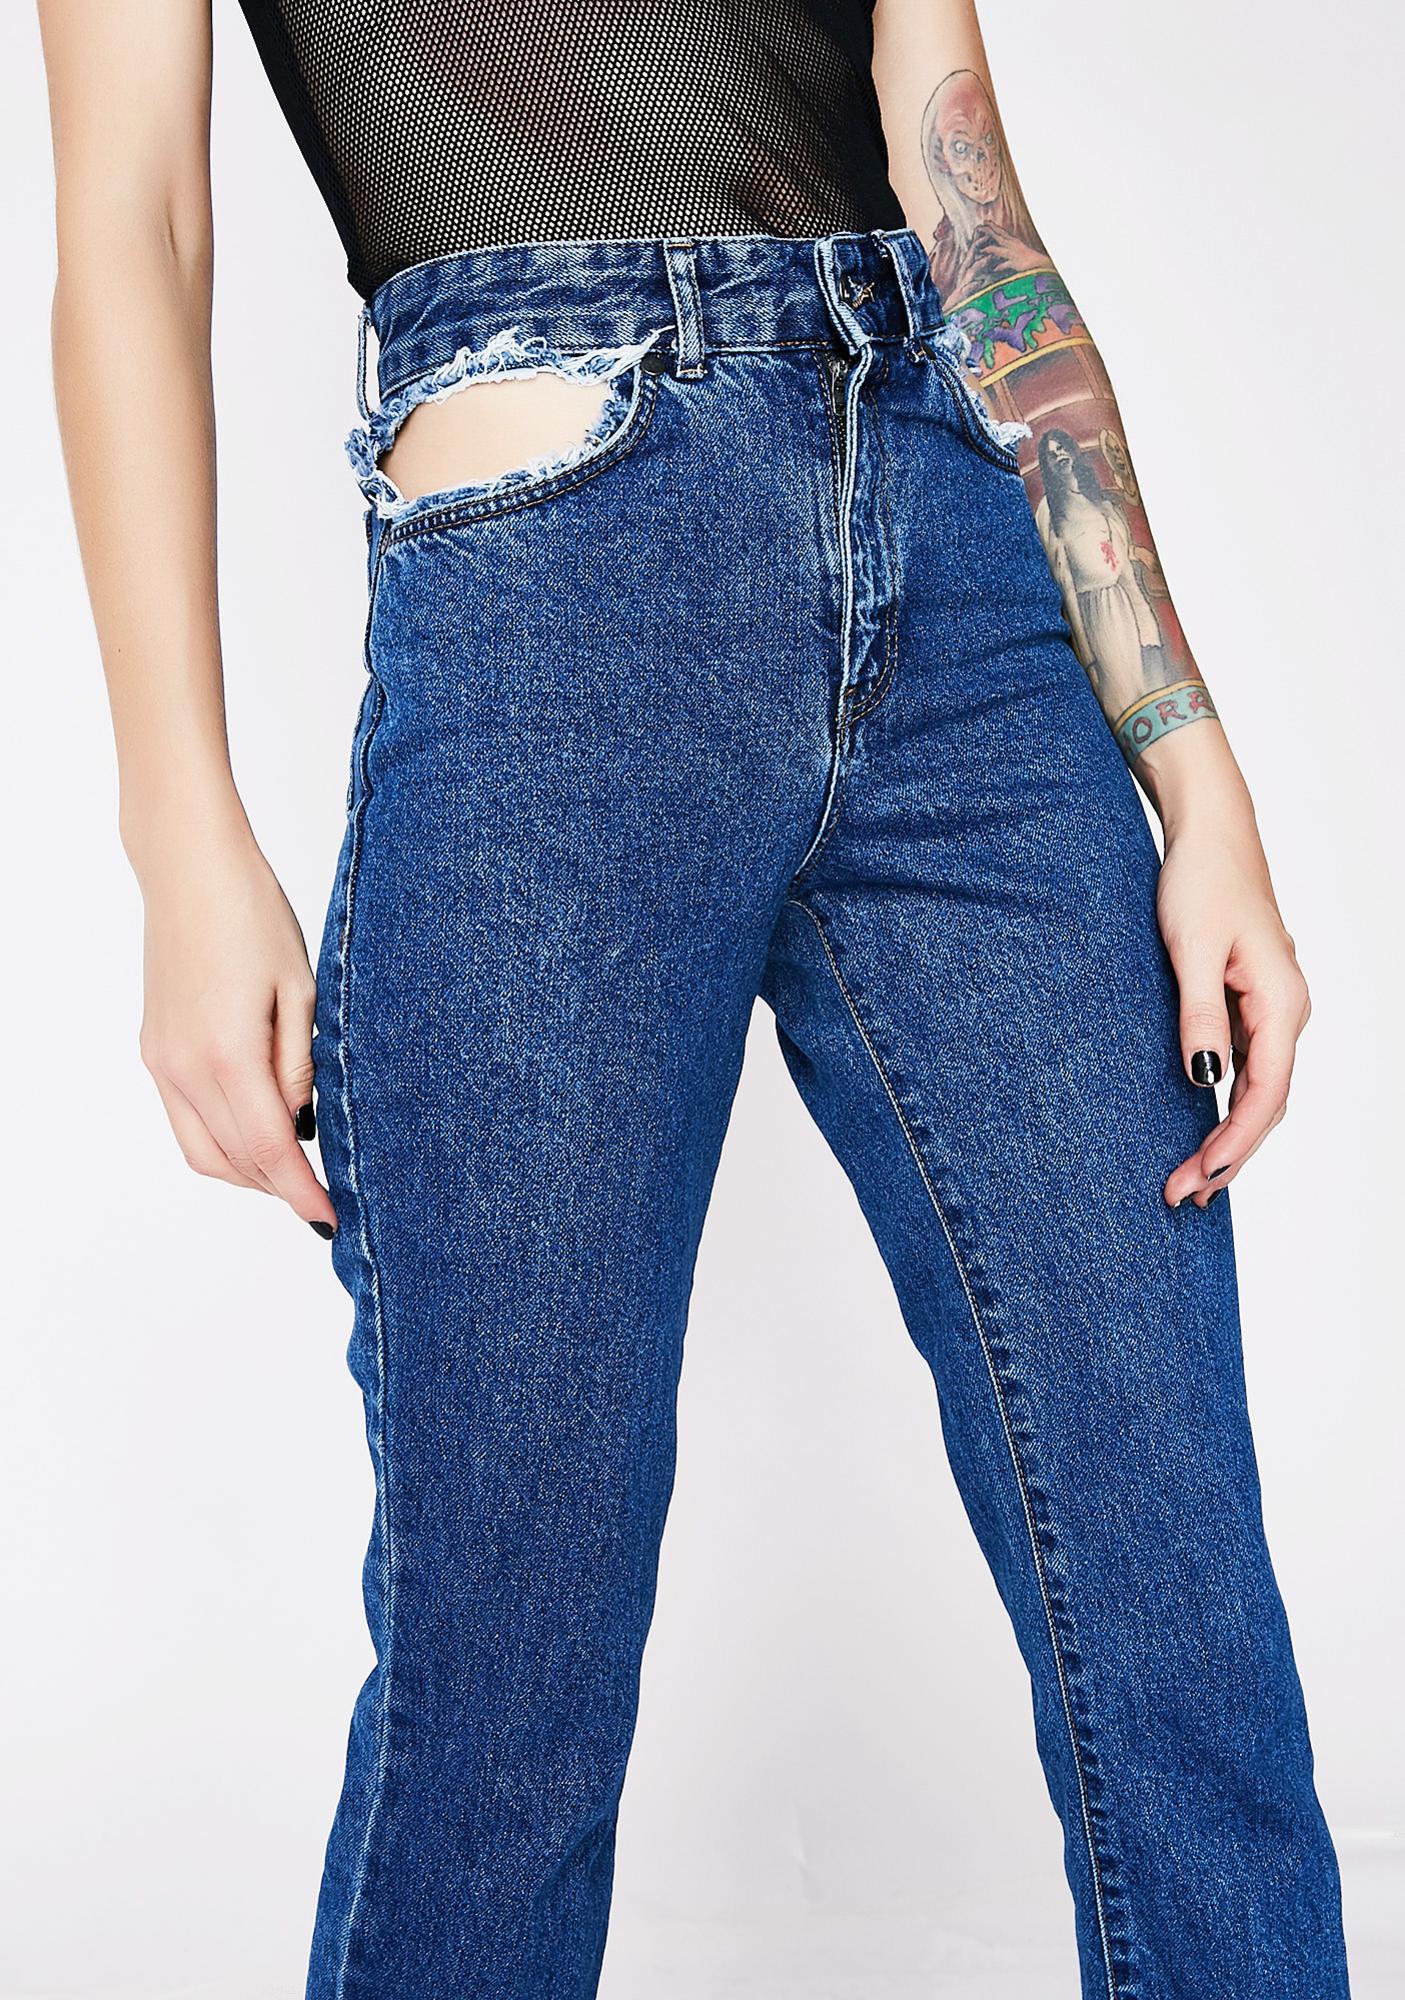 The Ragged Priest Pocket Money Jeans